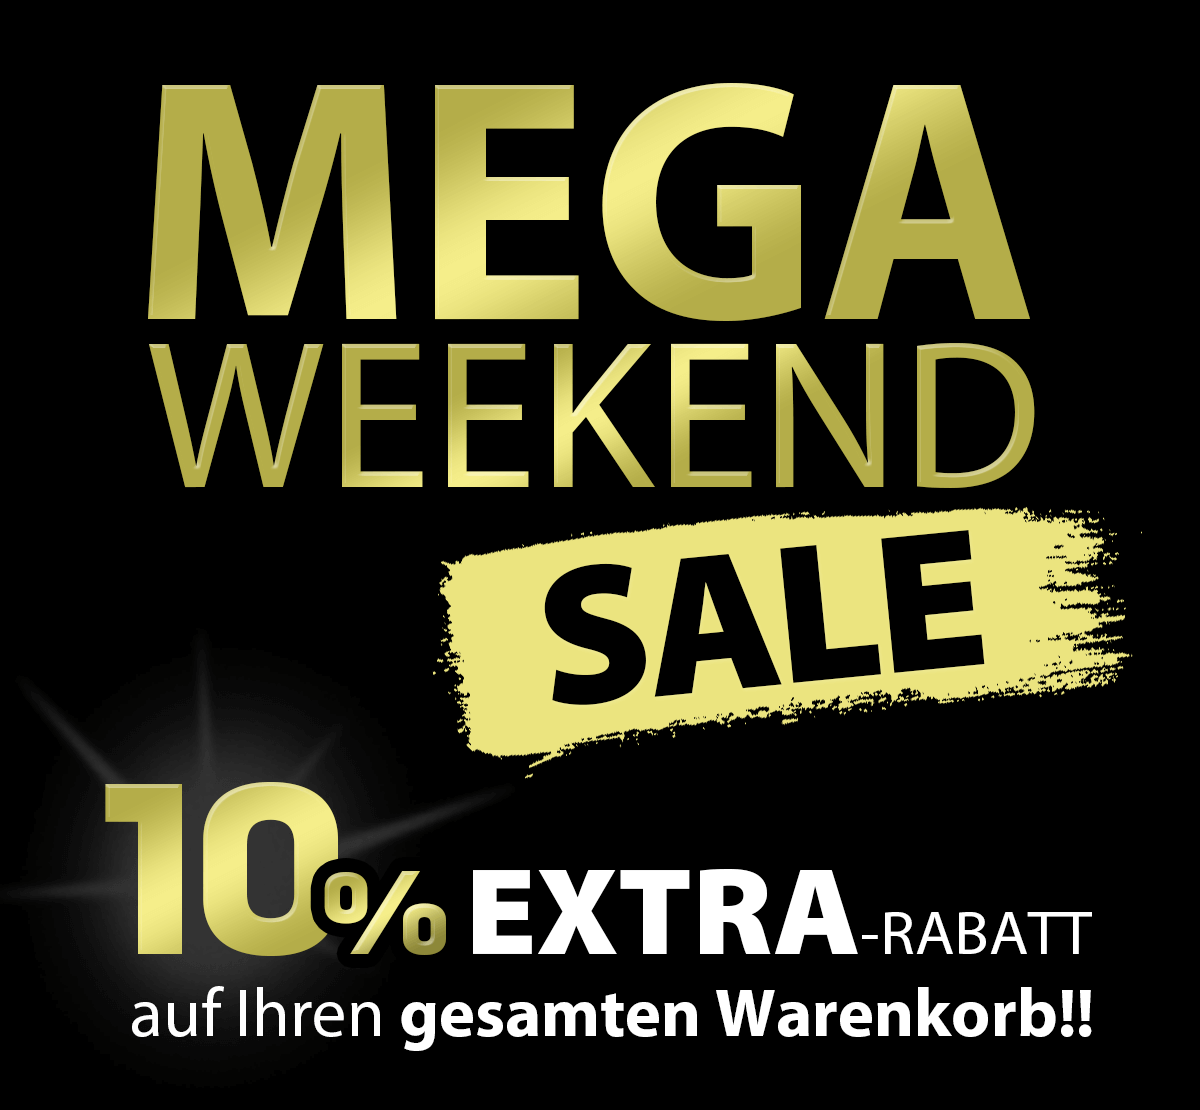 MEGA WEEKEND SALE!! - 10% EXTRA-RABATT auf Ihren gesamten Warenkor! Nur bis Mo. 05.07.